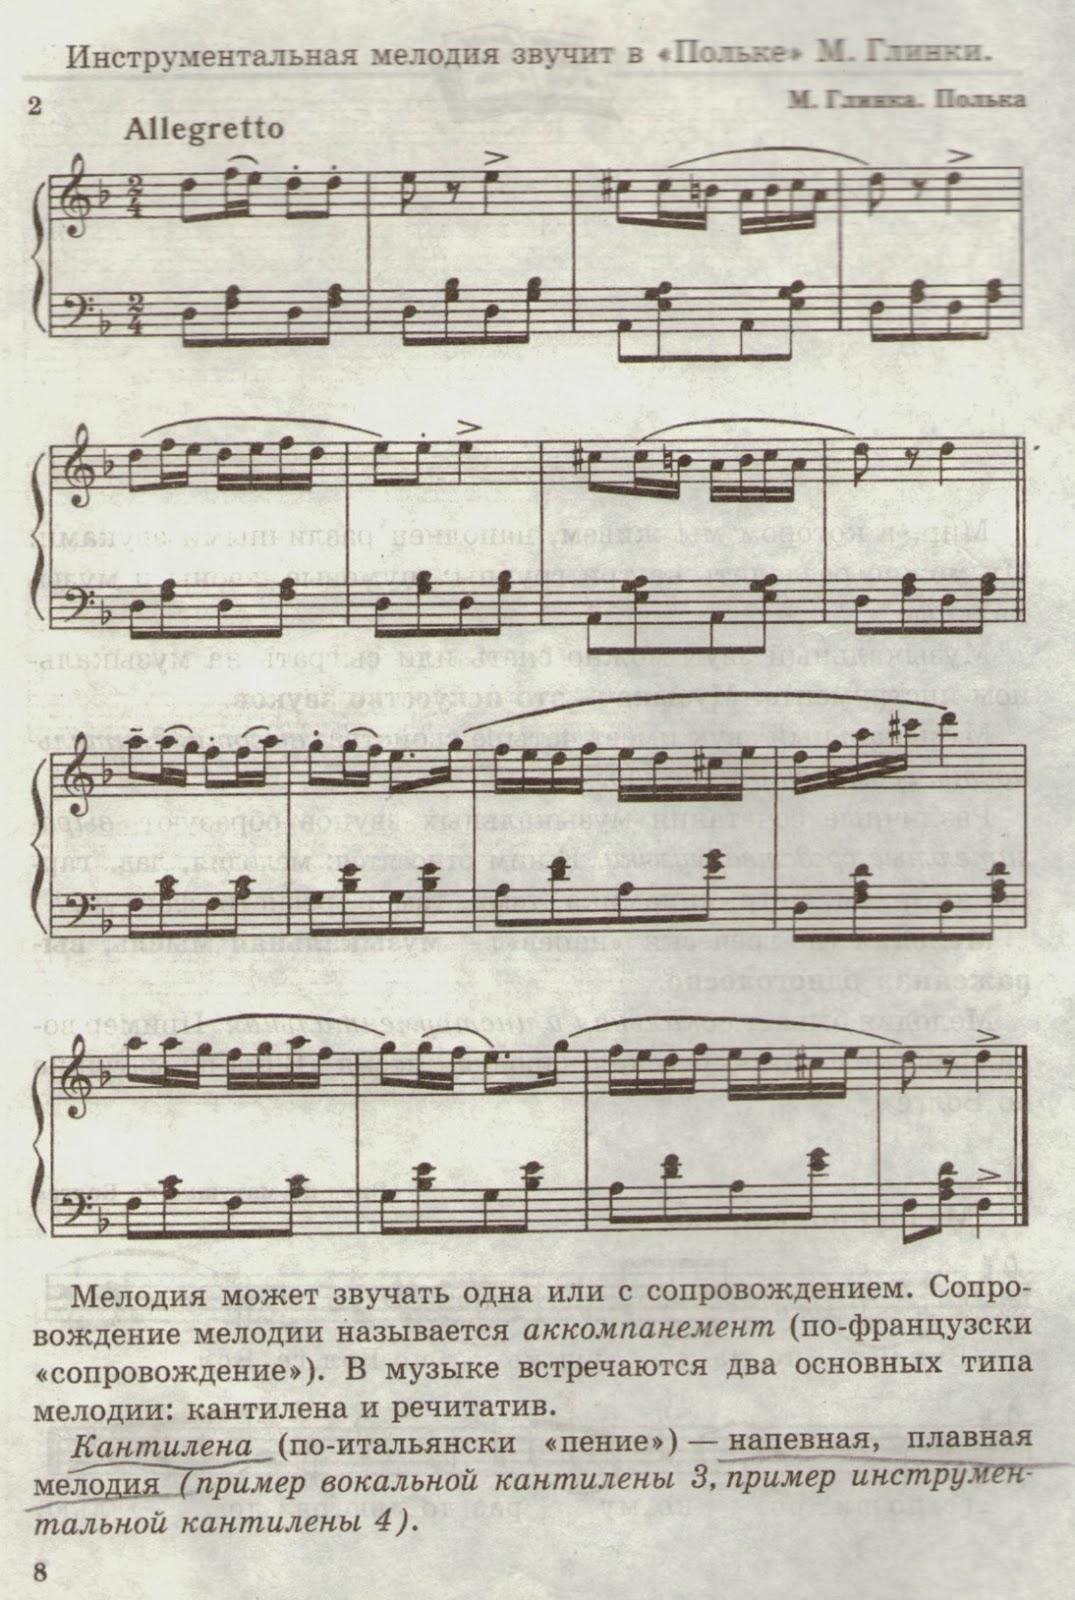 бетховен сурок слушать фортепиано со словами